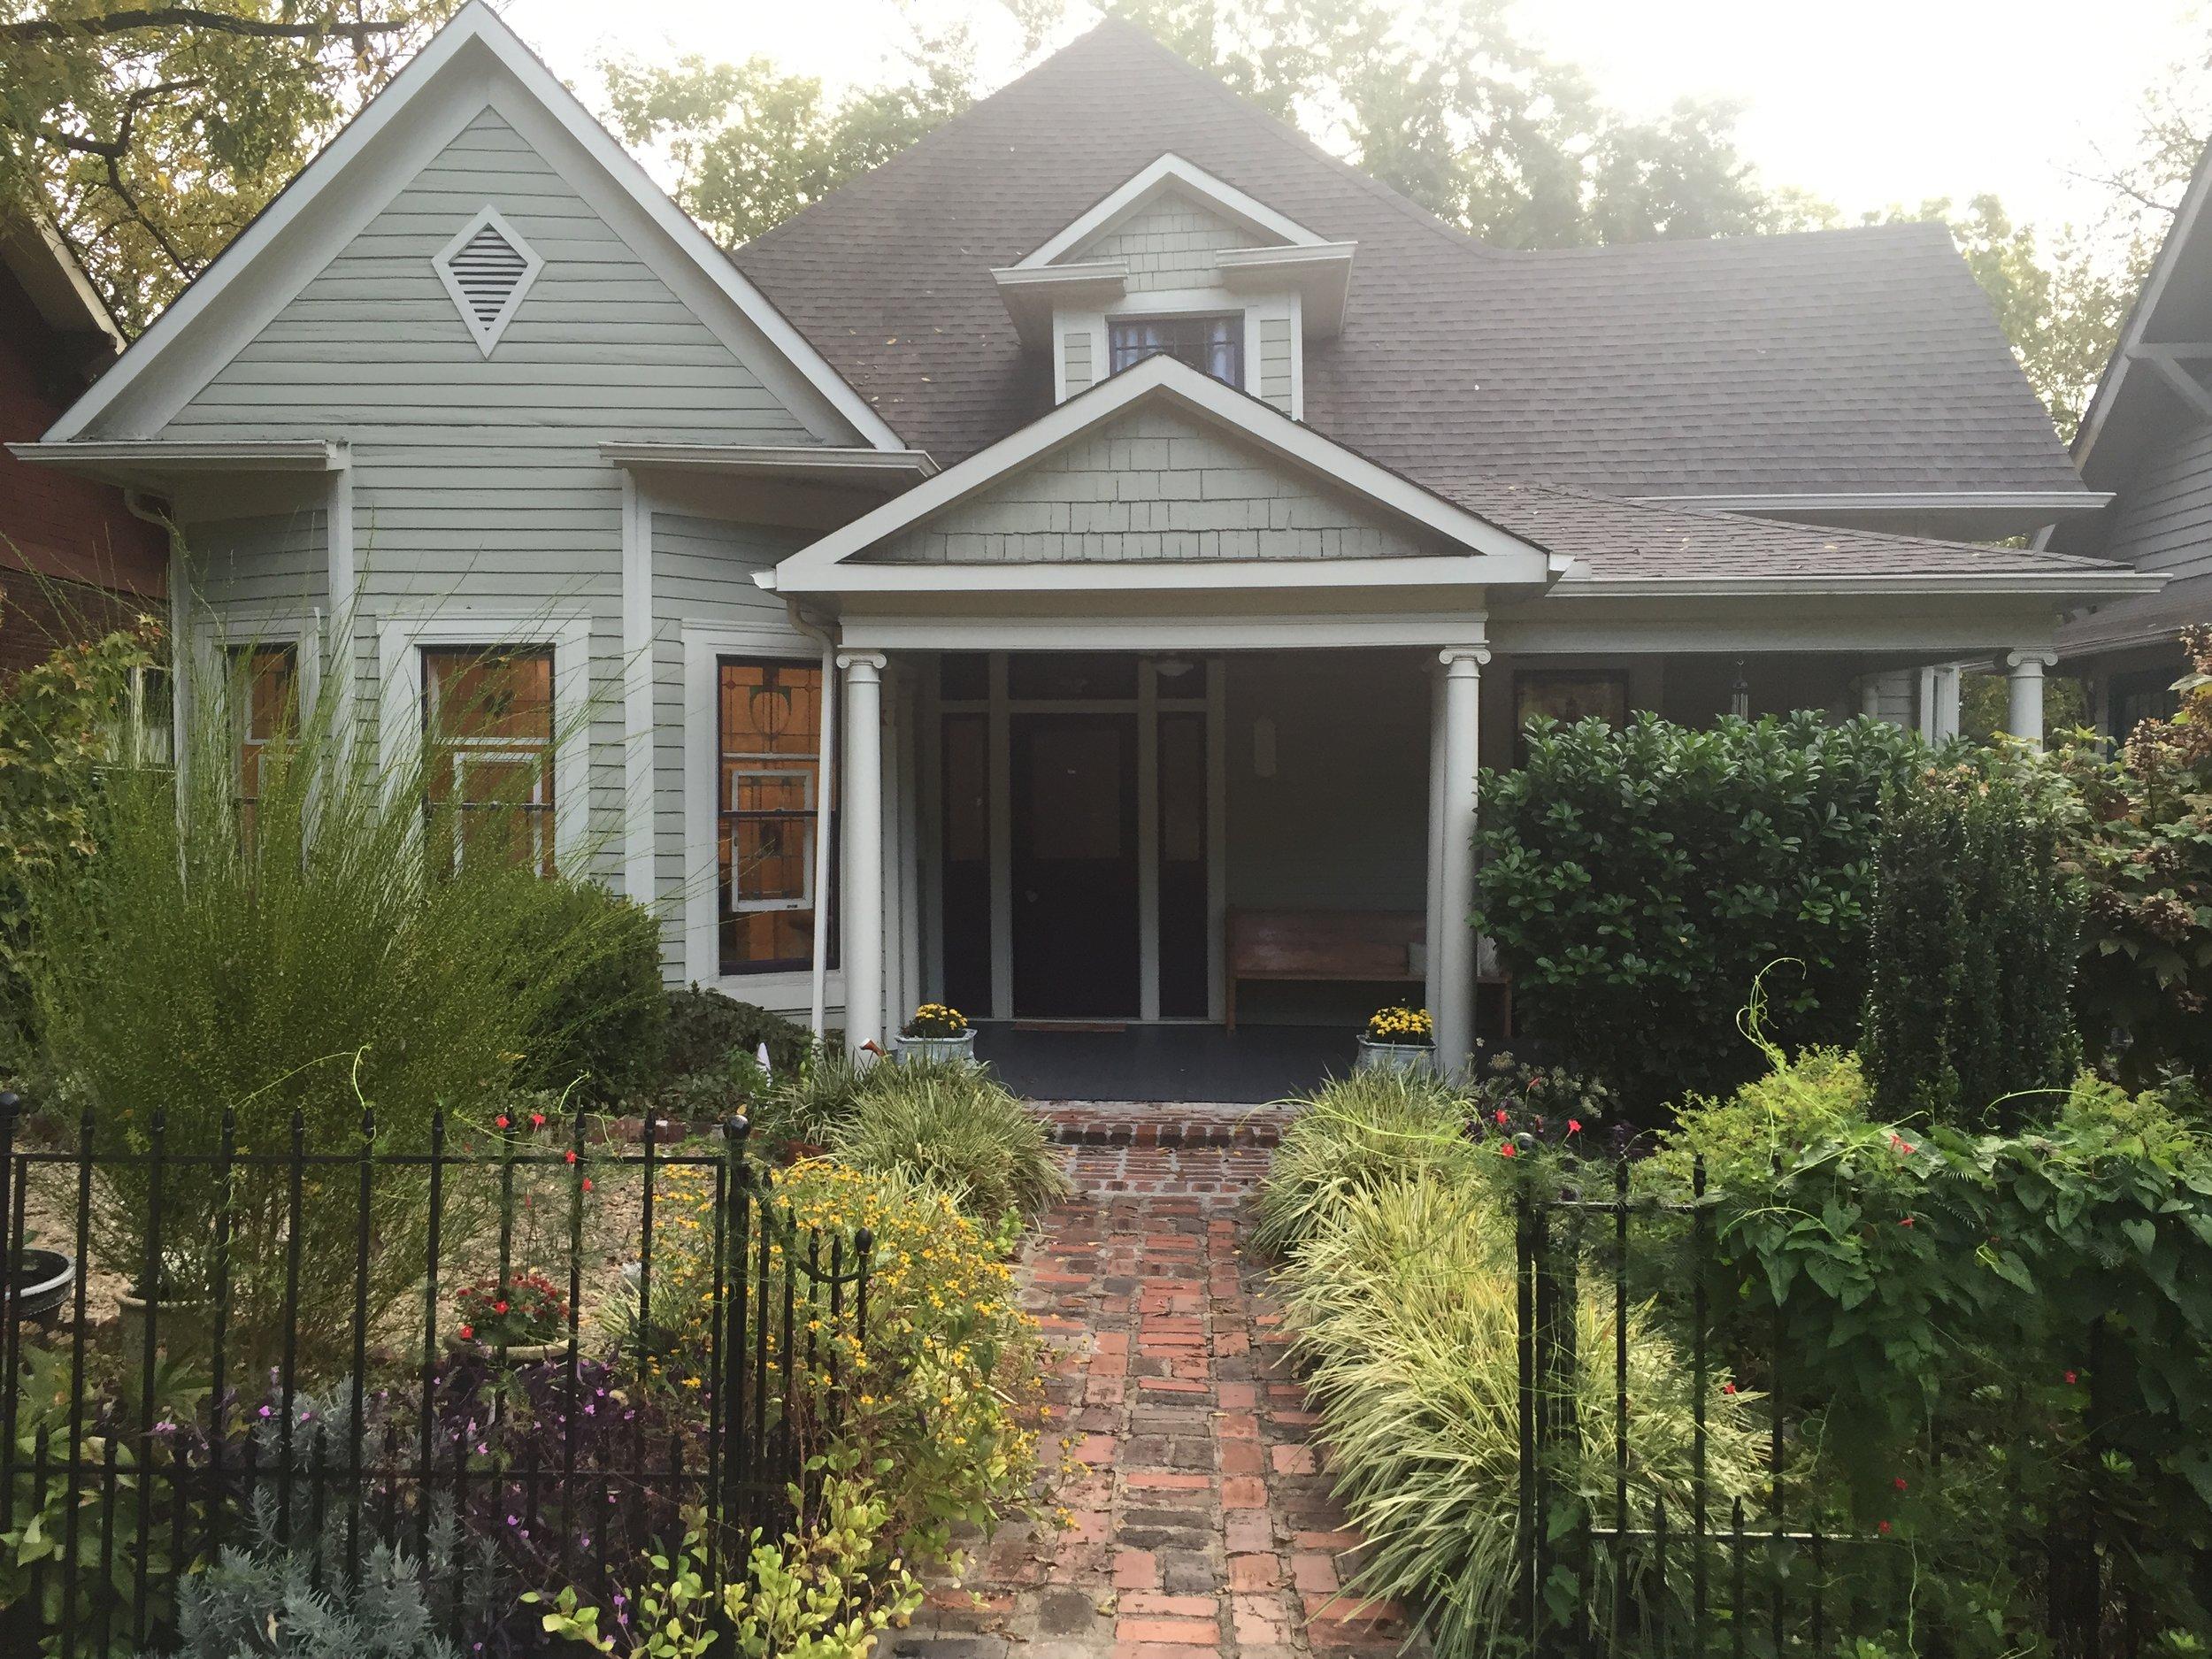 Super cute Airbnb in Knoxville, Tn – The dream team's dream house.